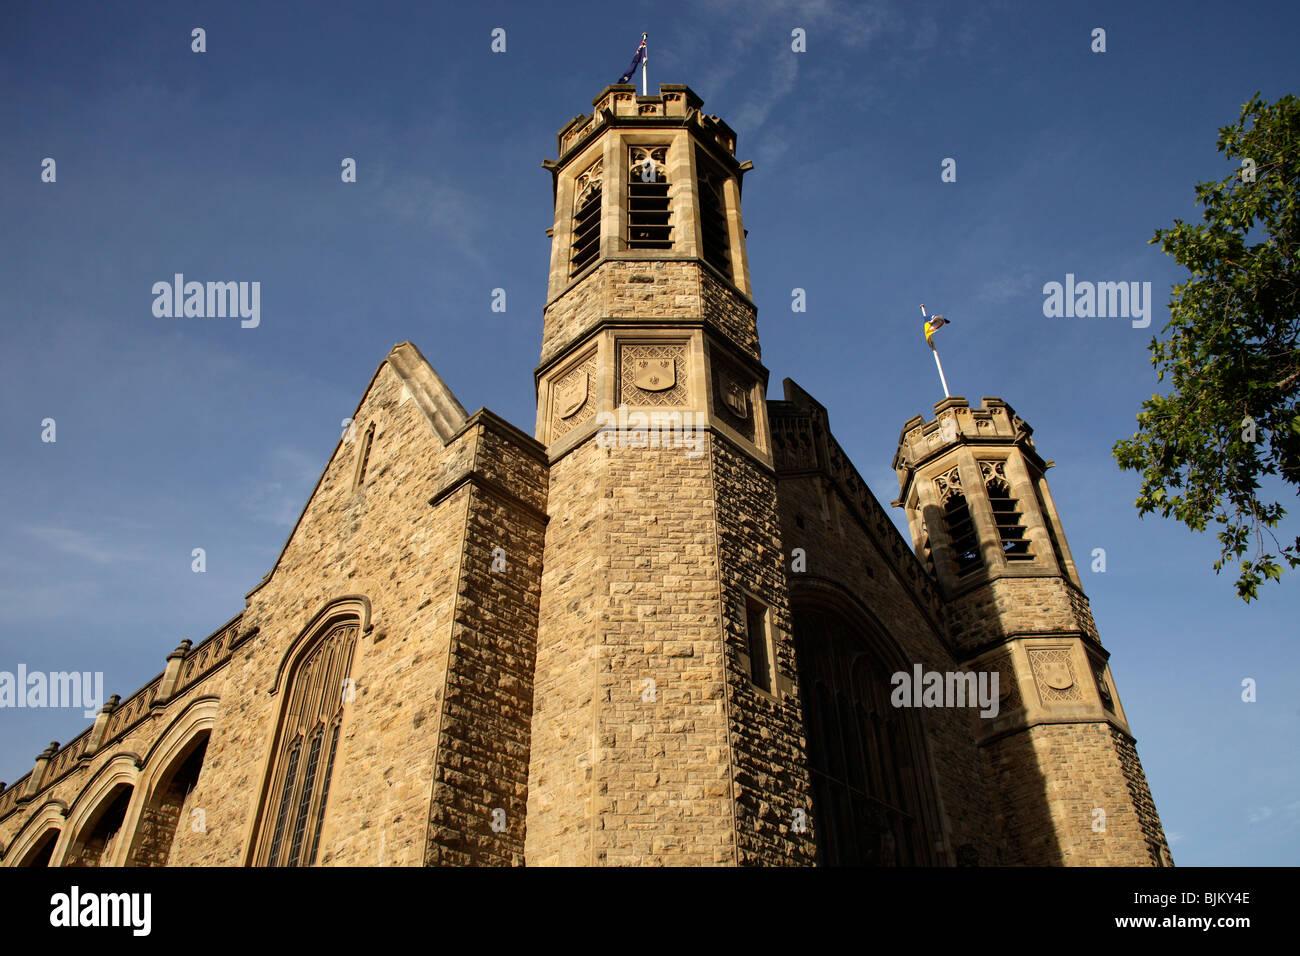 Historic buildings of the University of Adelaide, South Australia, Australia Stock Photo